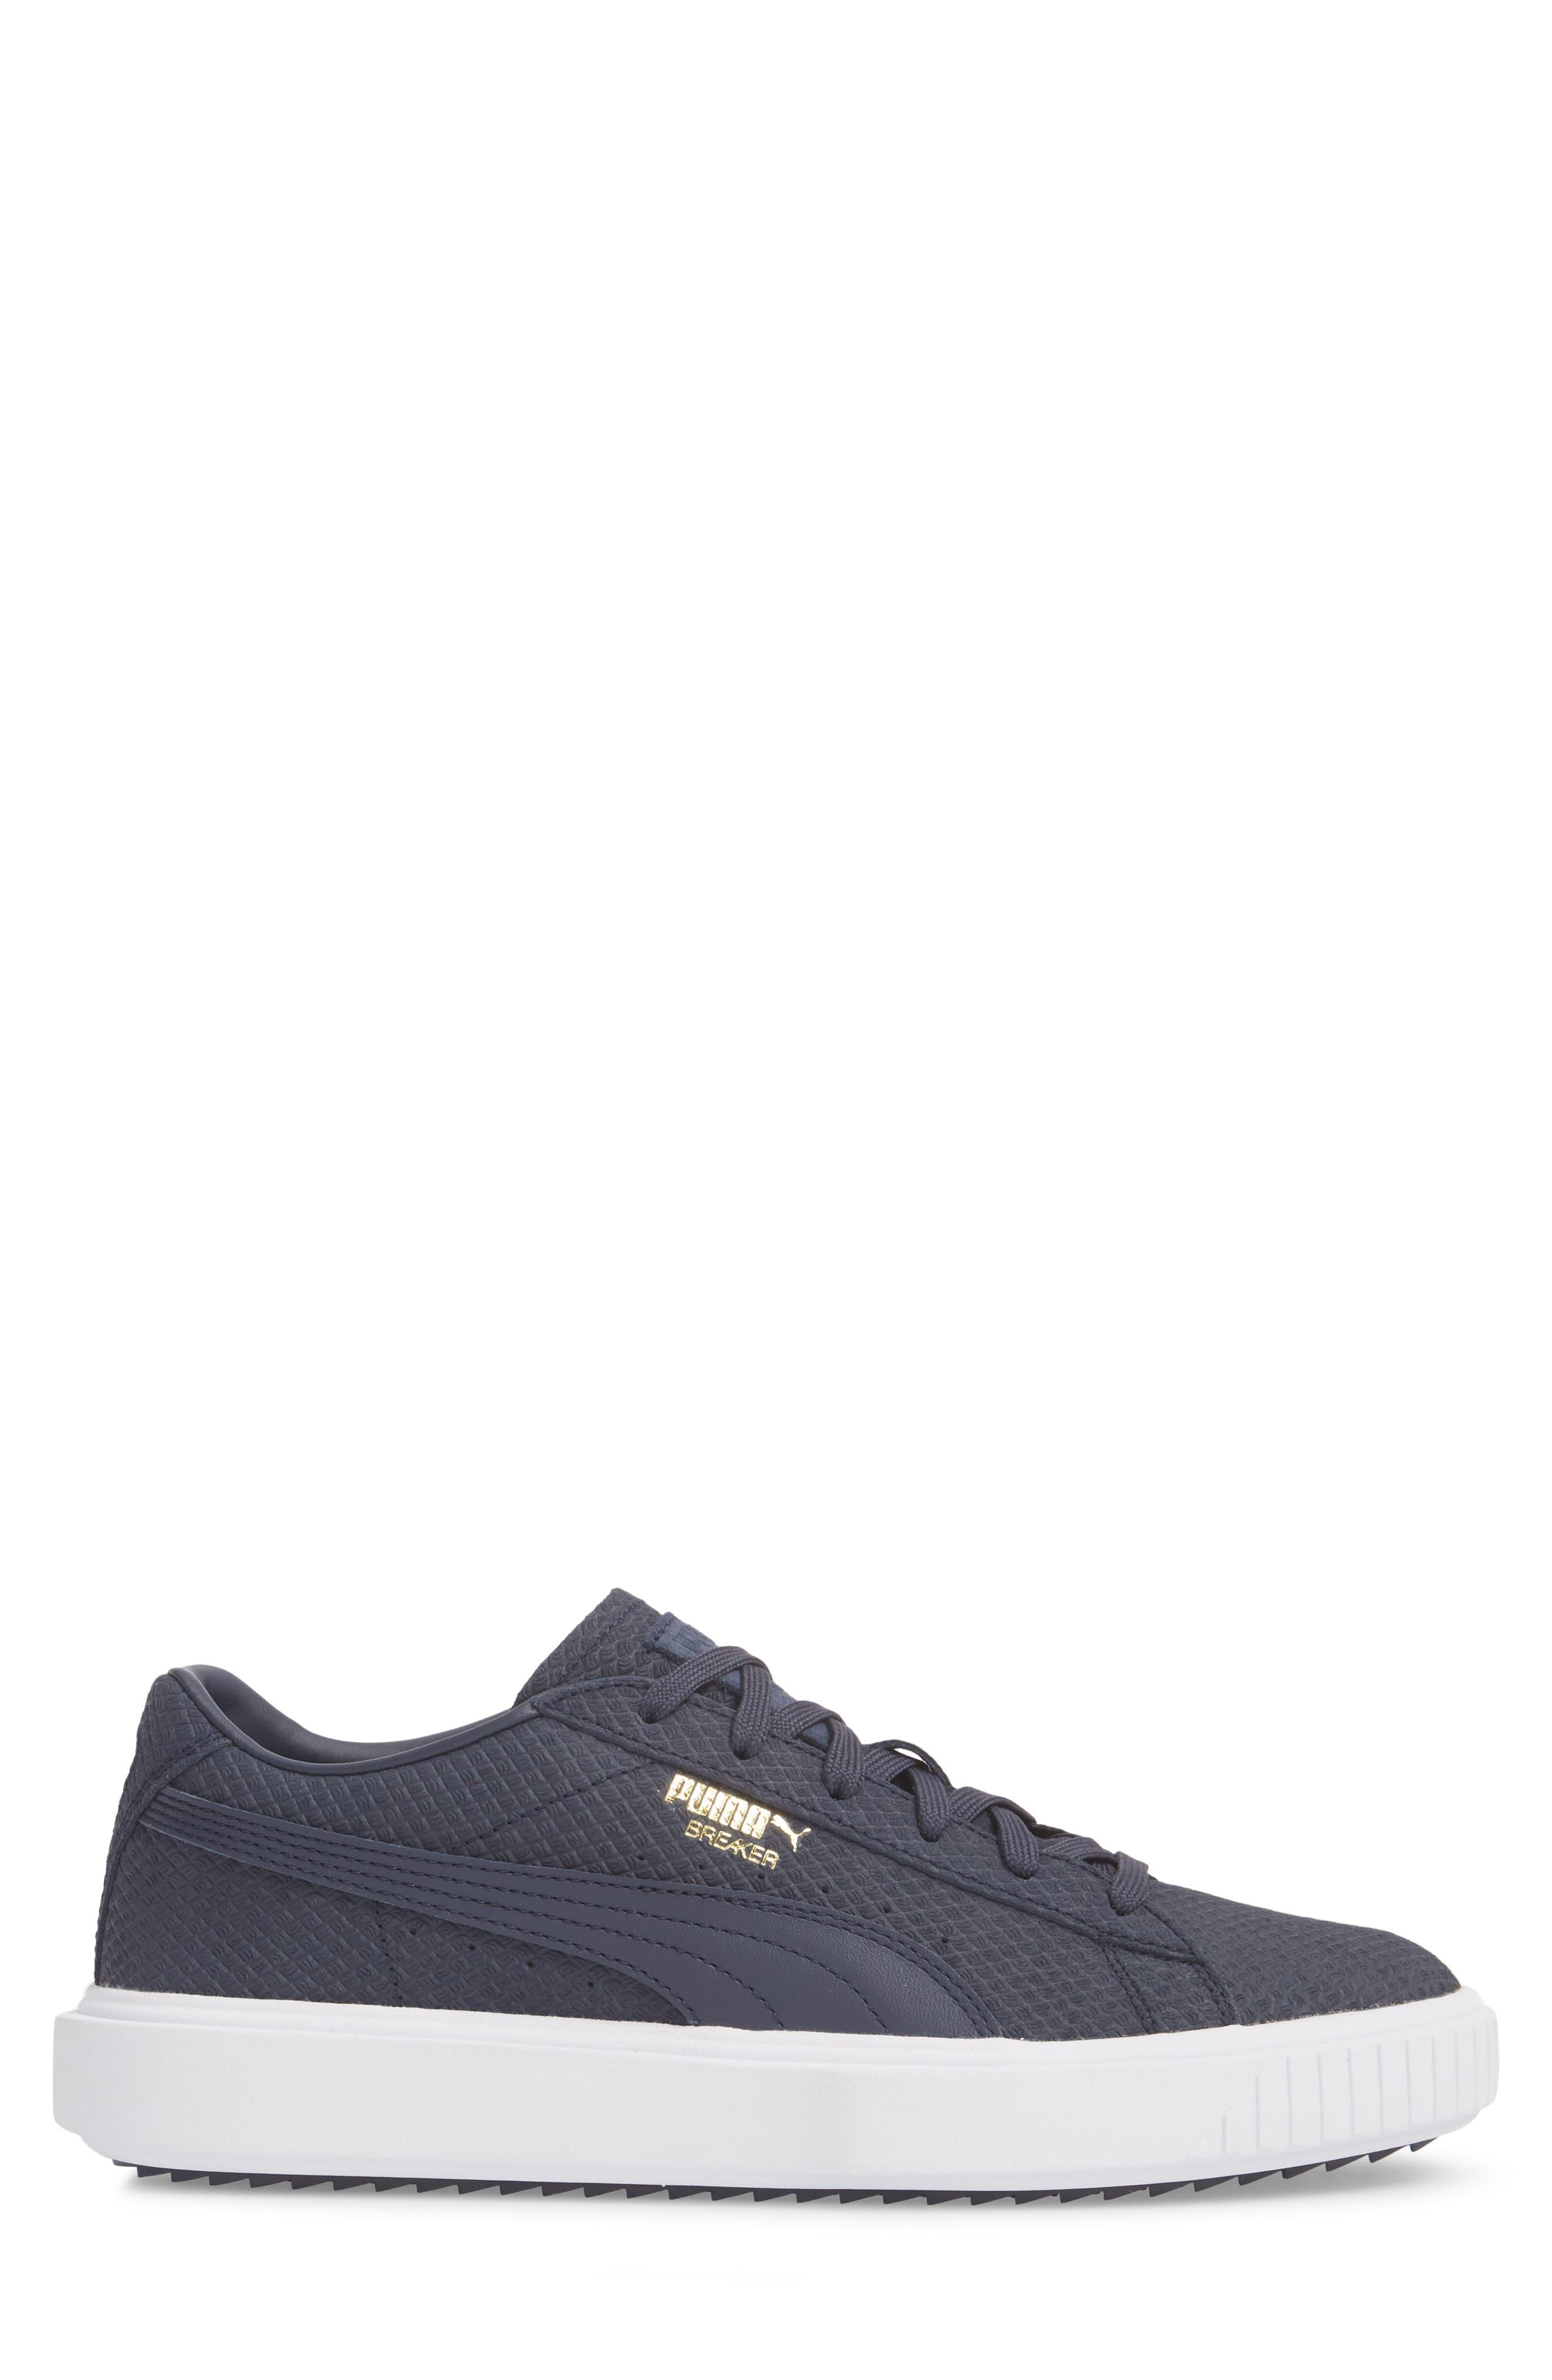 Breaker Suede Sneaker,                             Alternate thumbnail 3, color,                             400